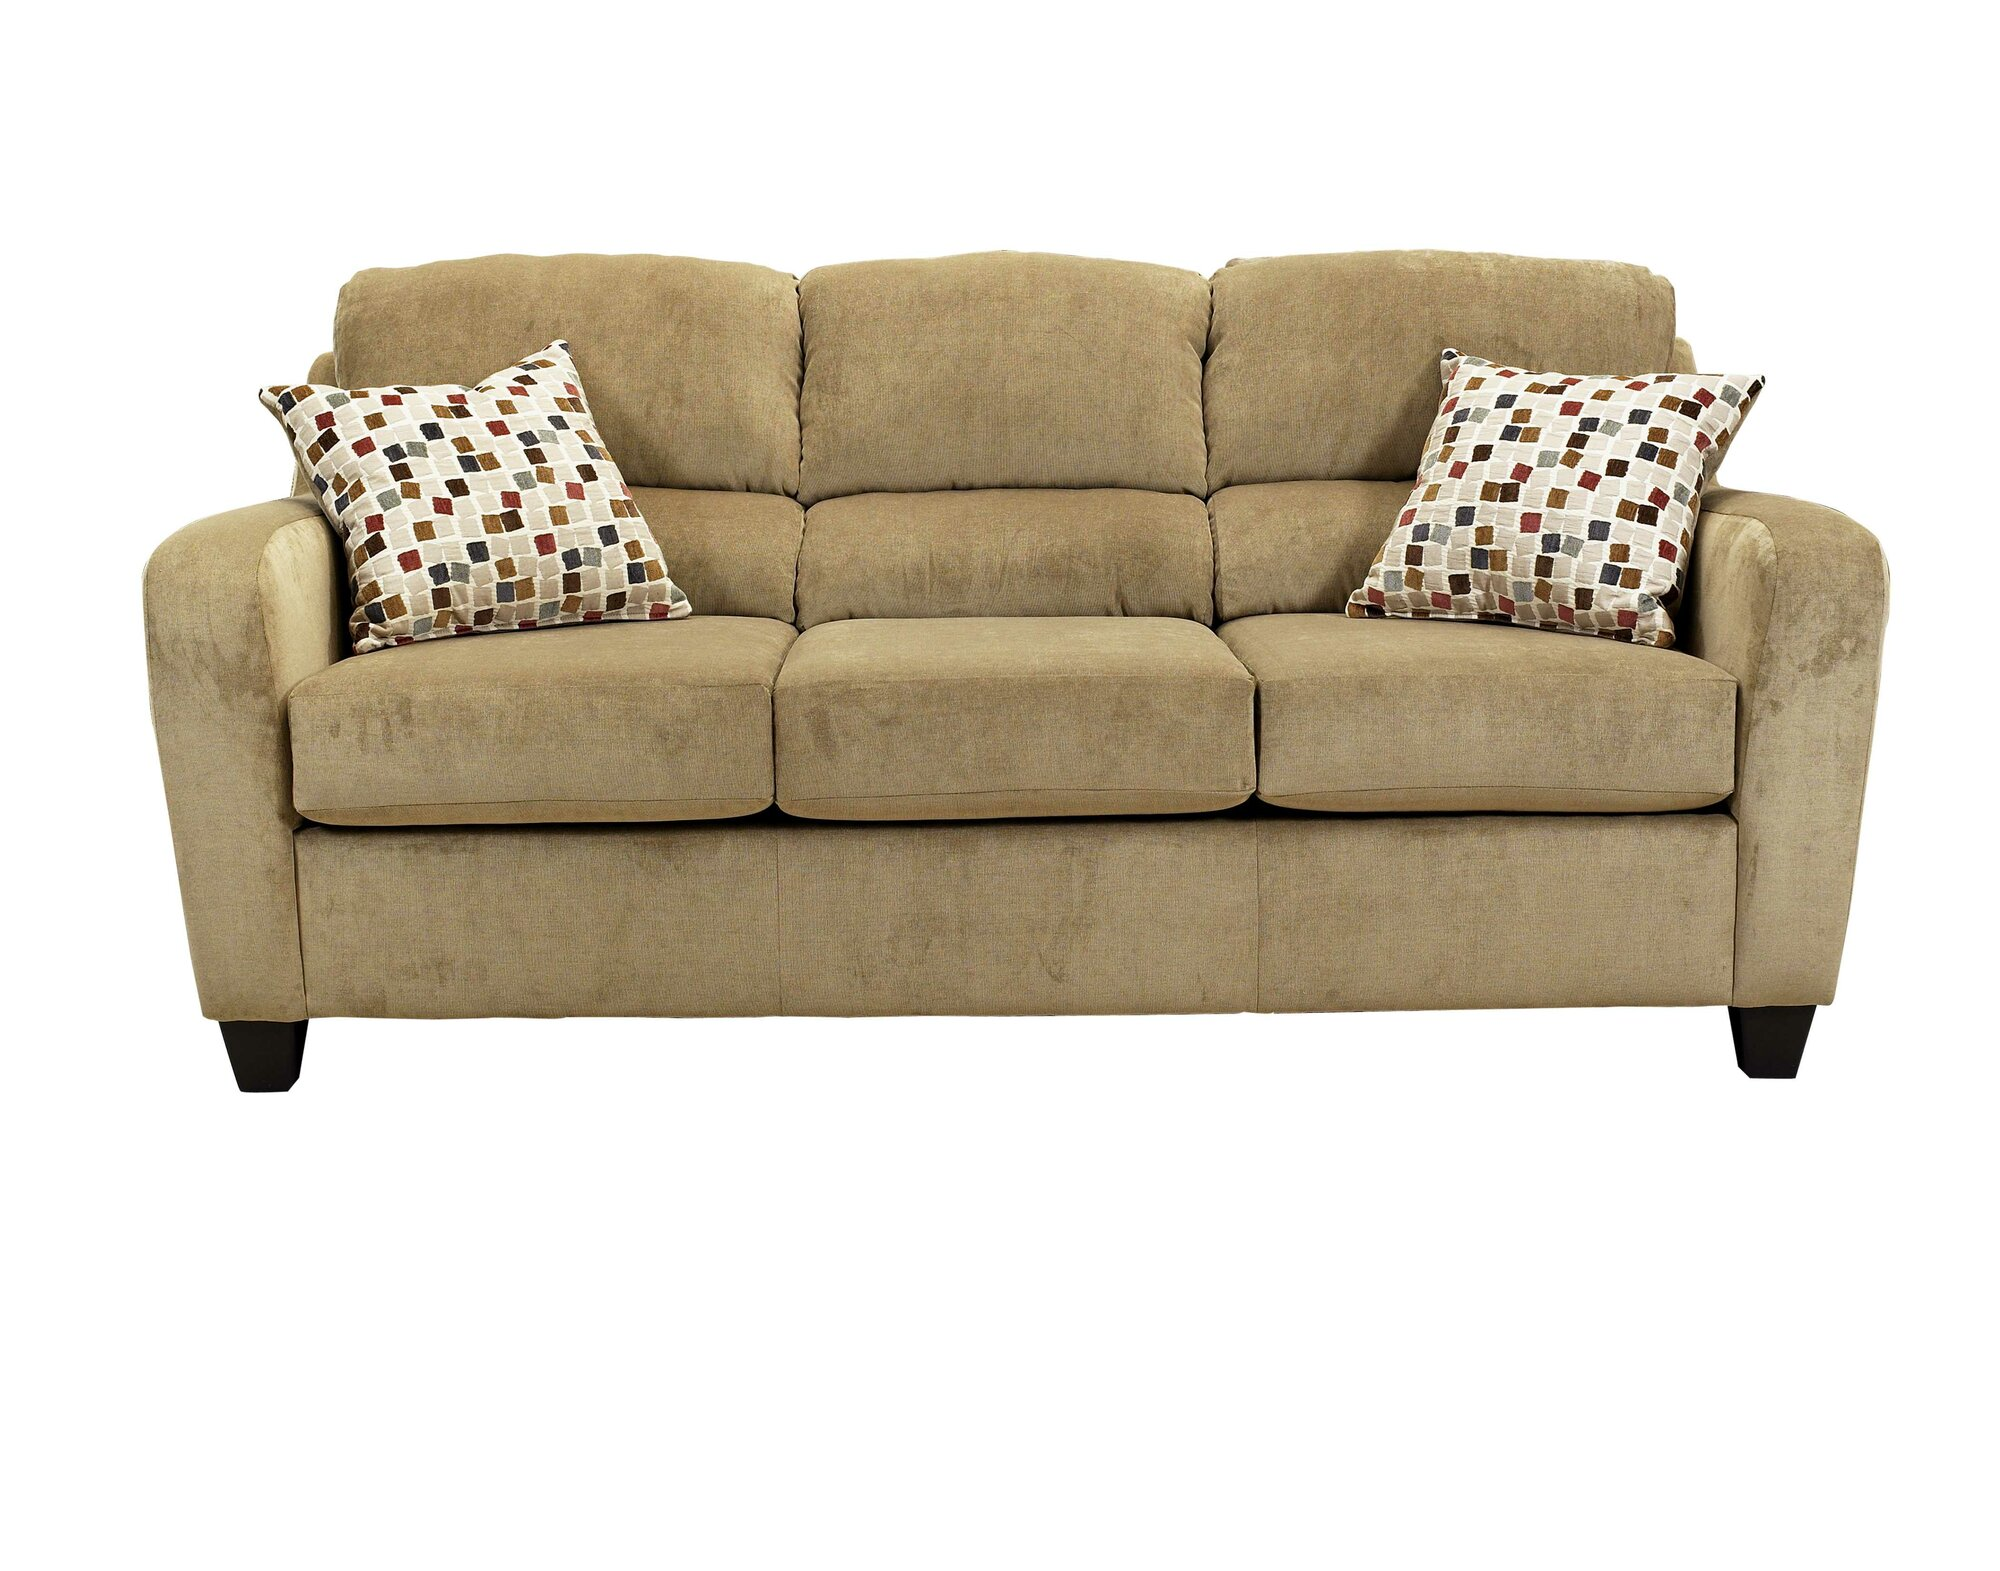 Serta Upholstery Queen Sleeper Sofa   eBay